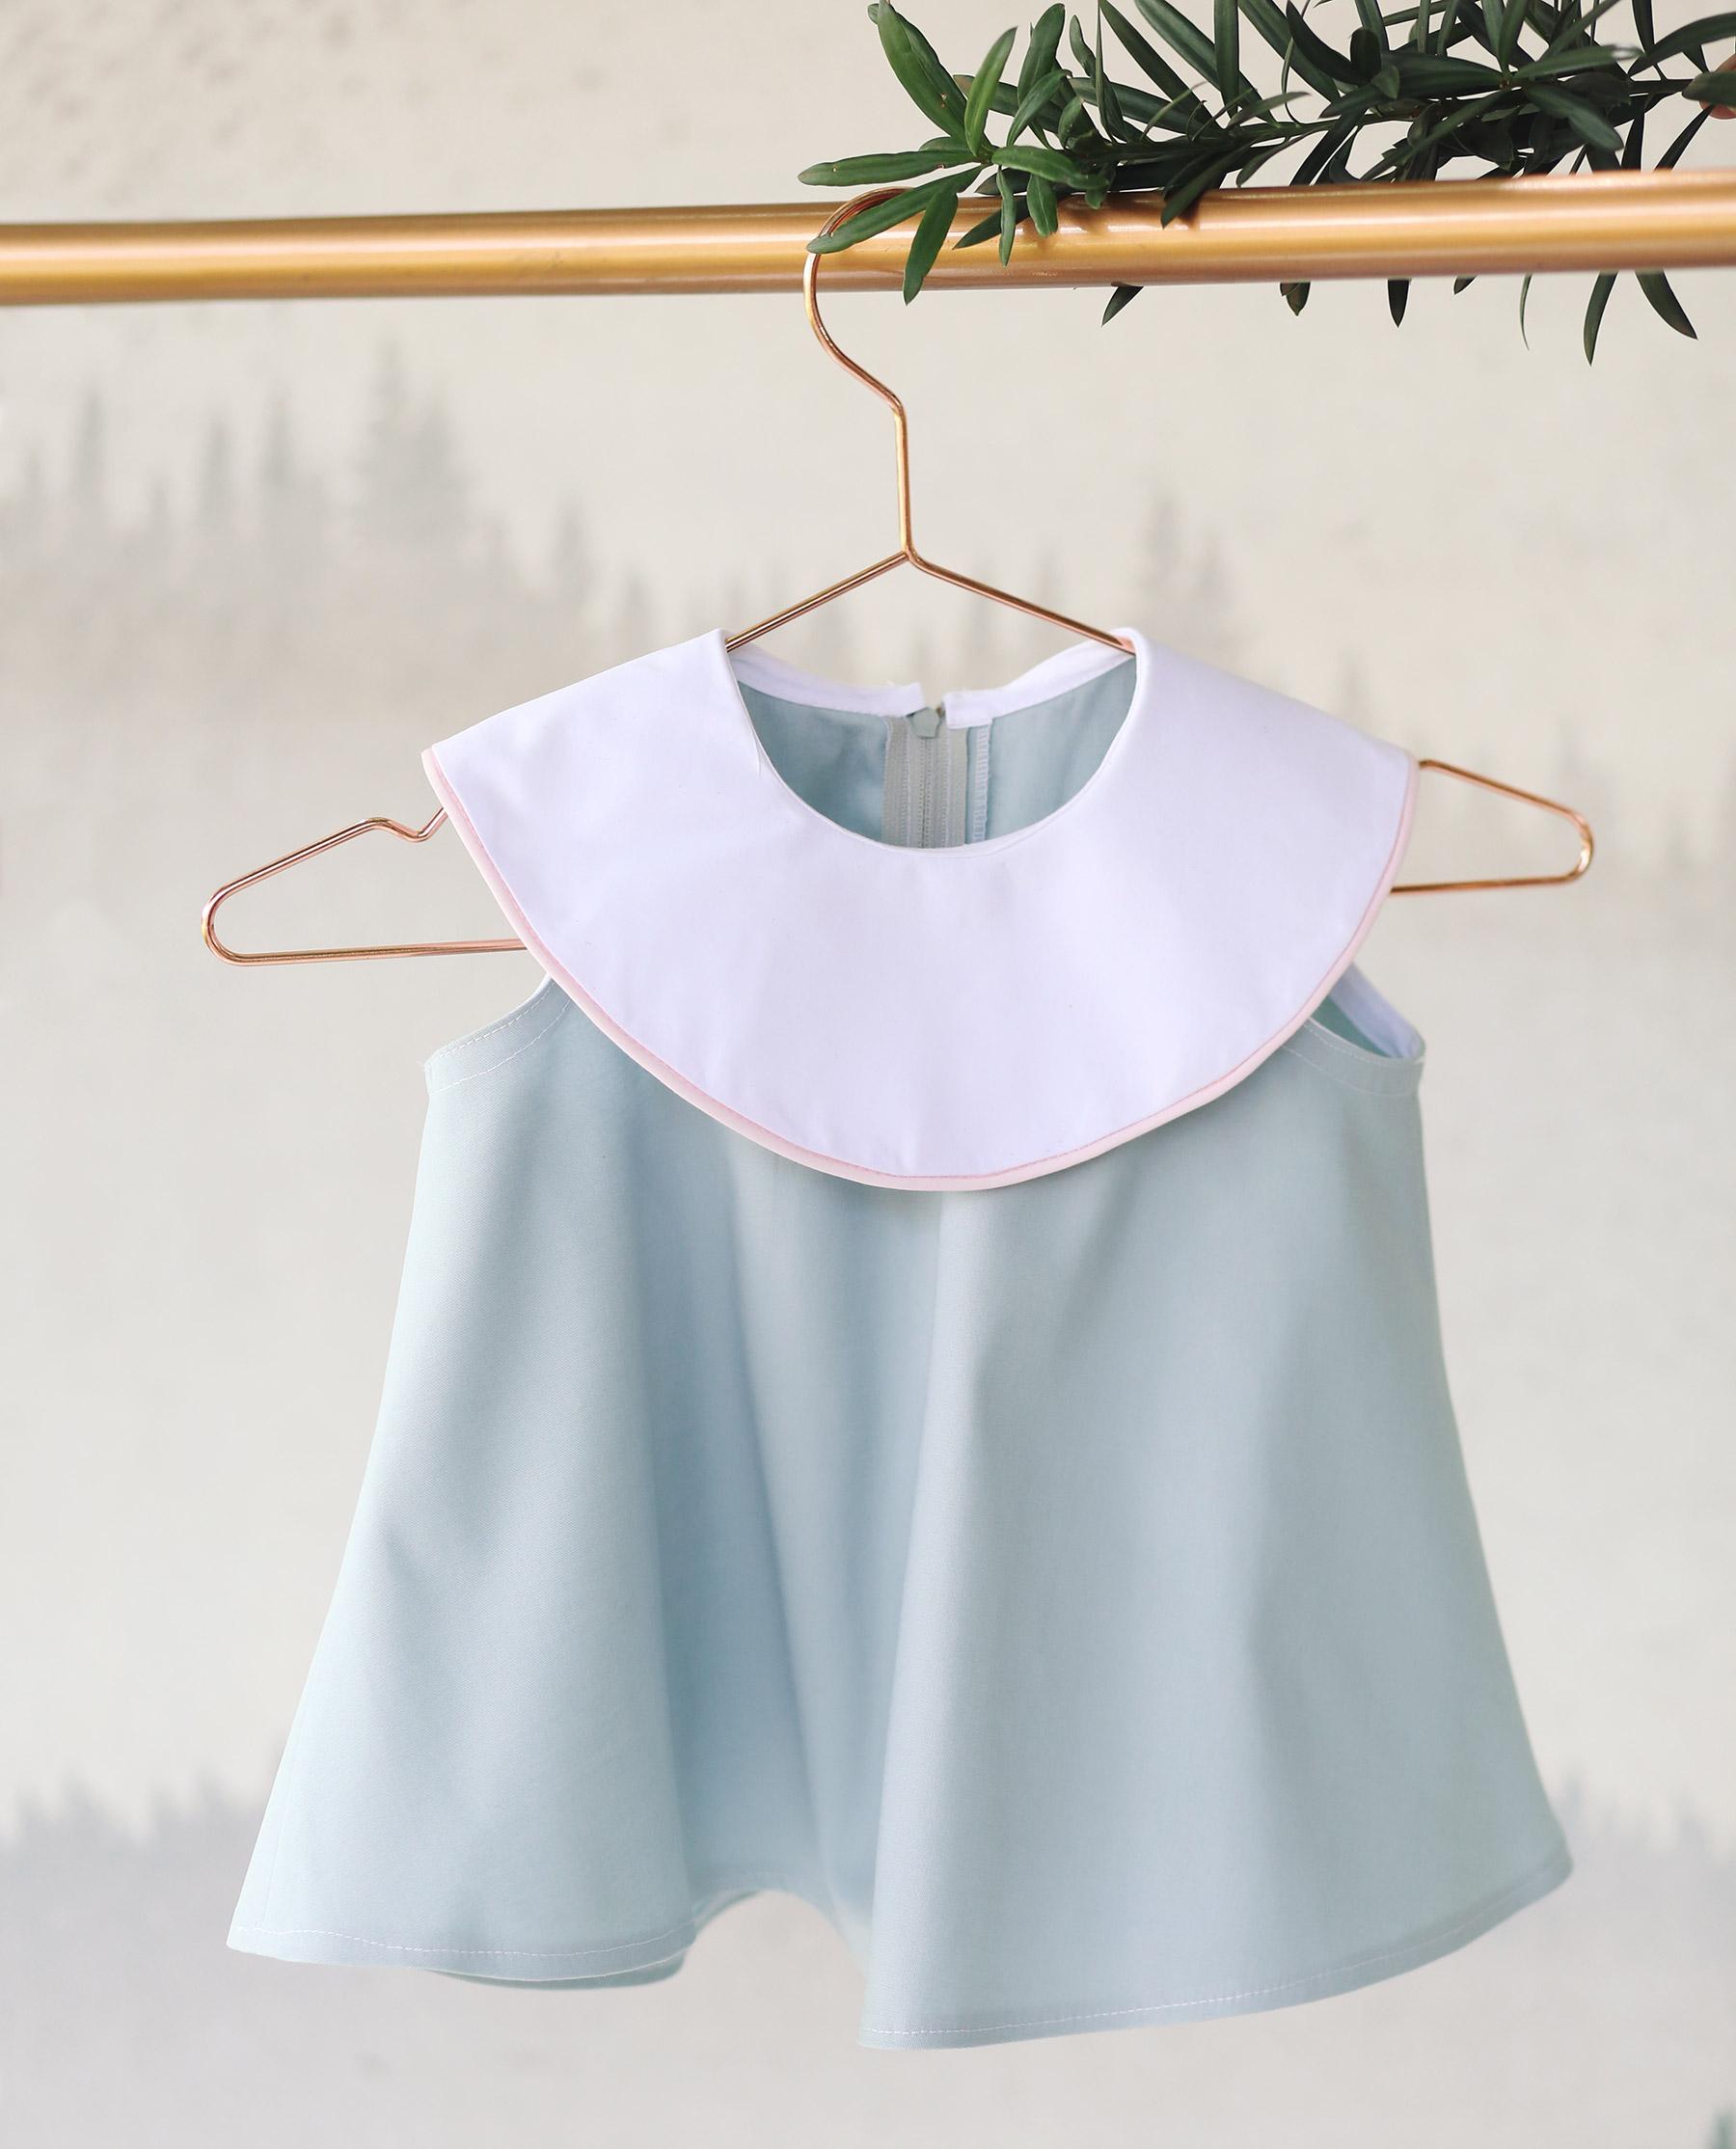 Kimmy & Bear clothing-16